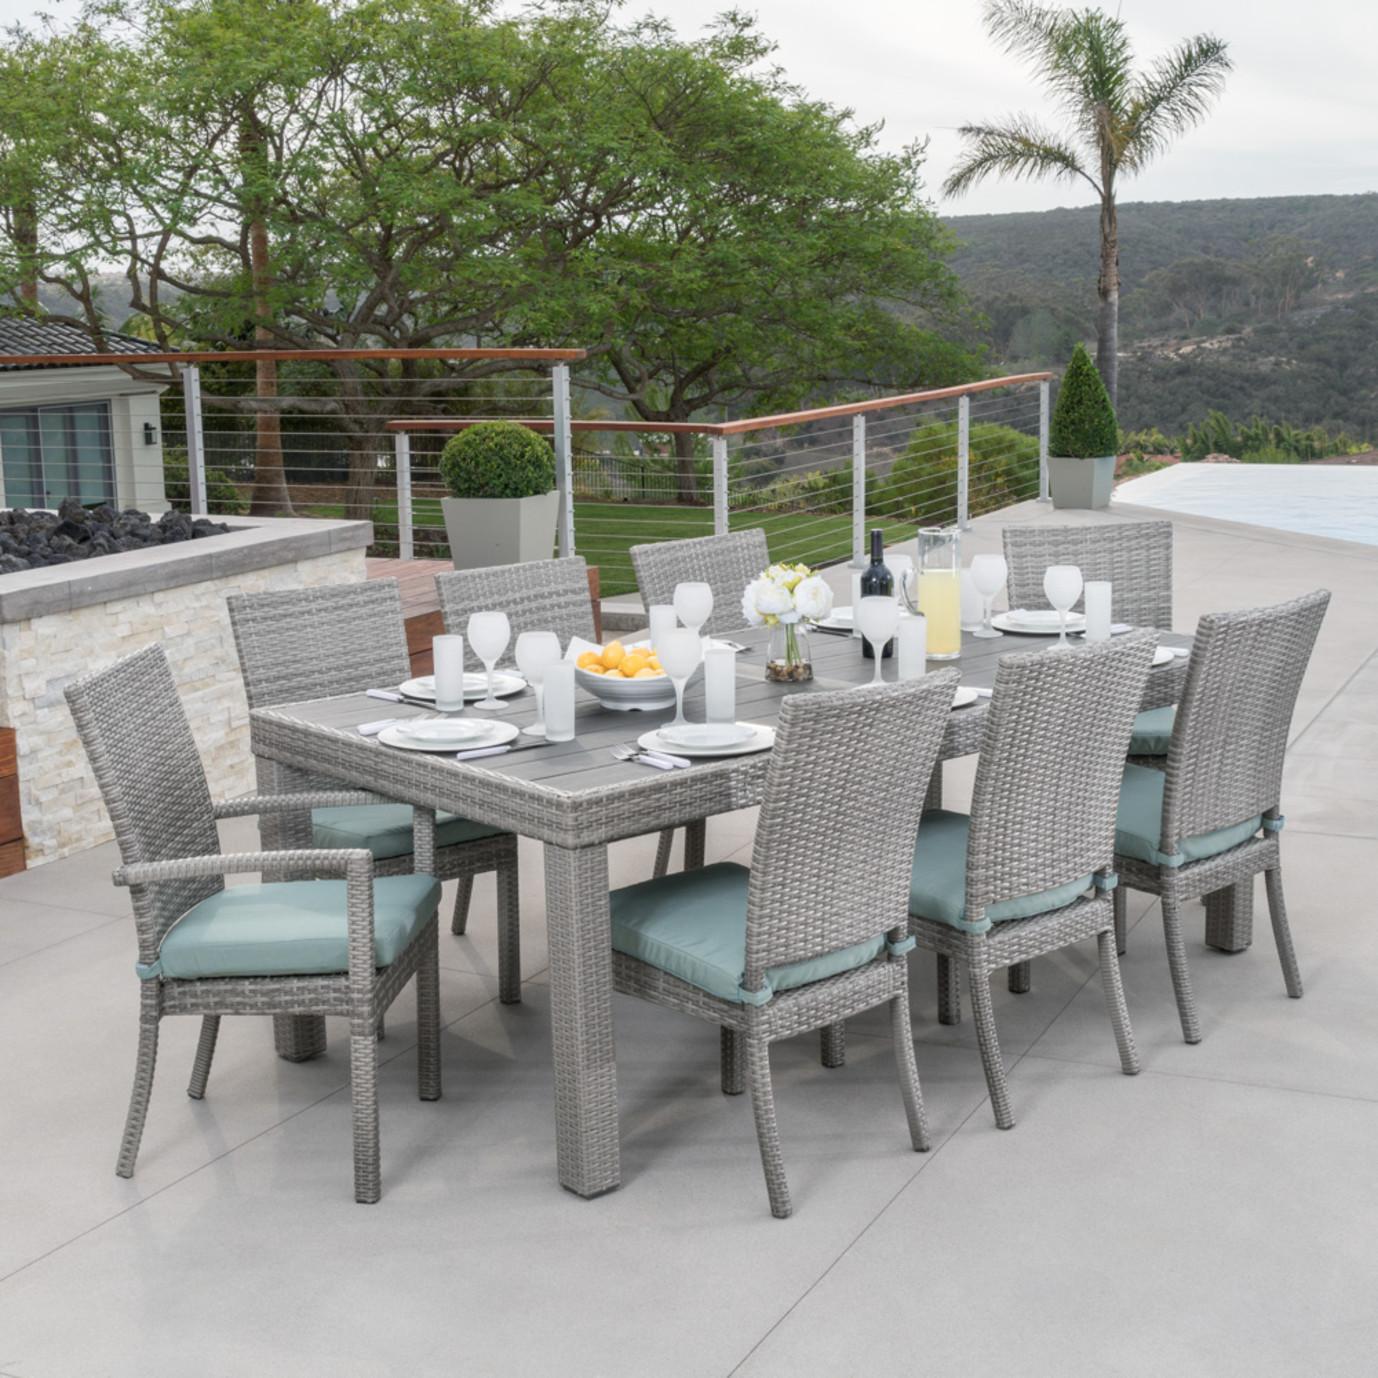 Cannes™ 9 Piece Dining Set - Spa Blue